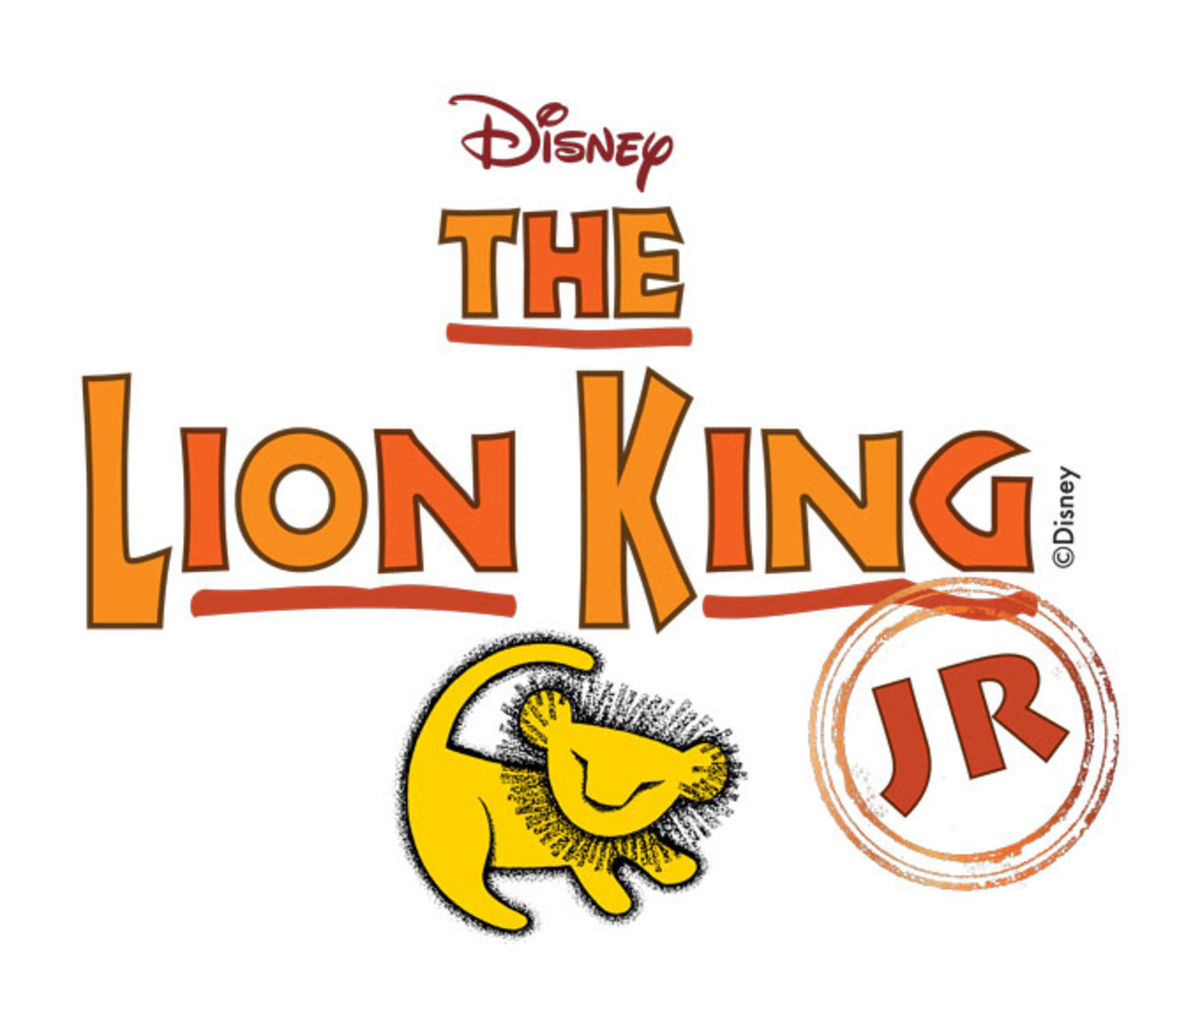 lion king synbol